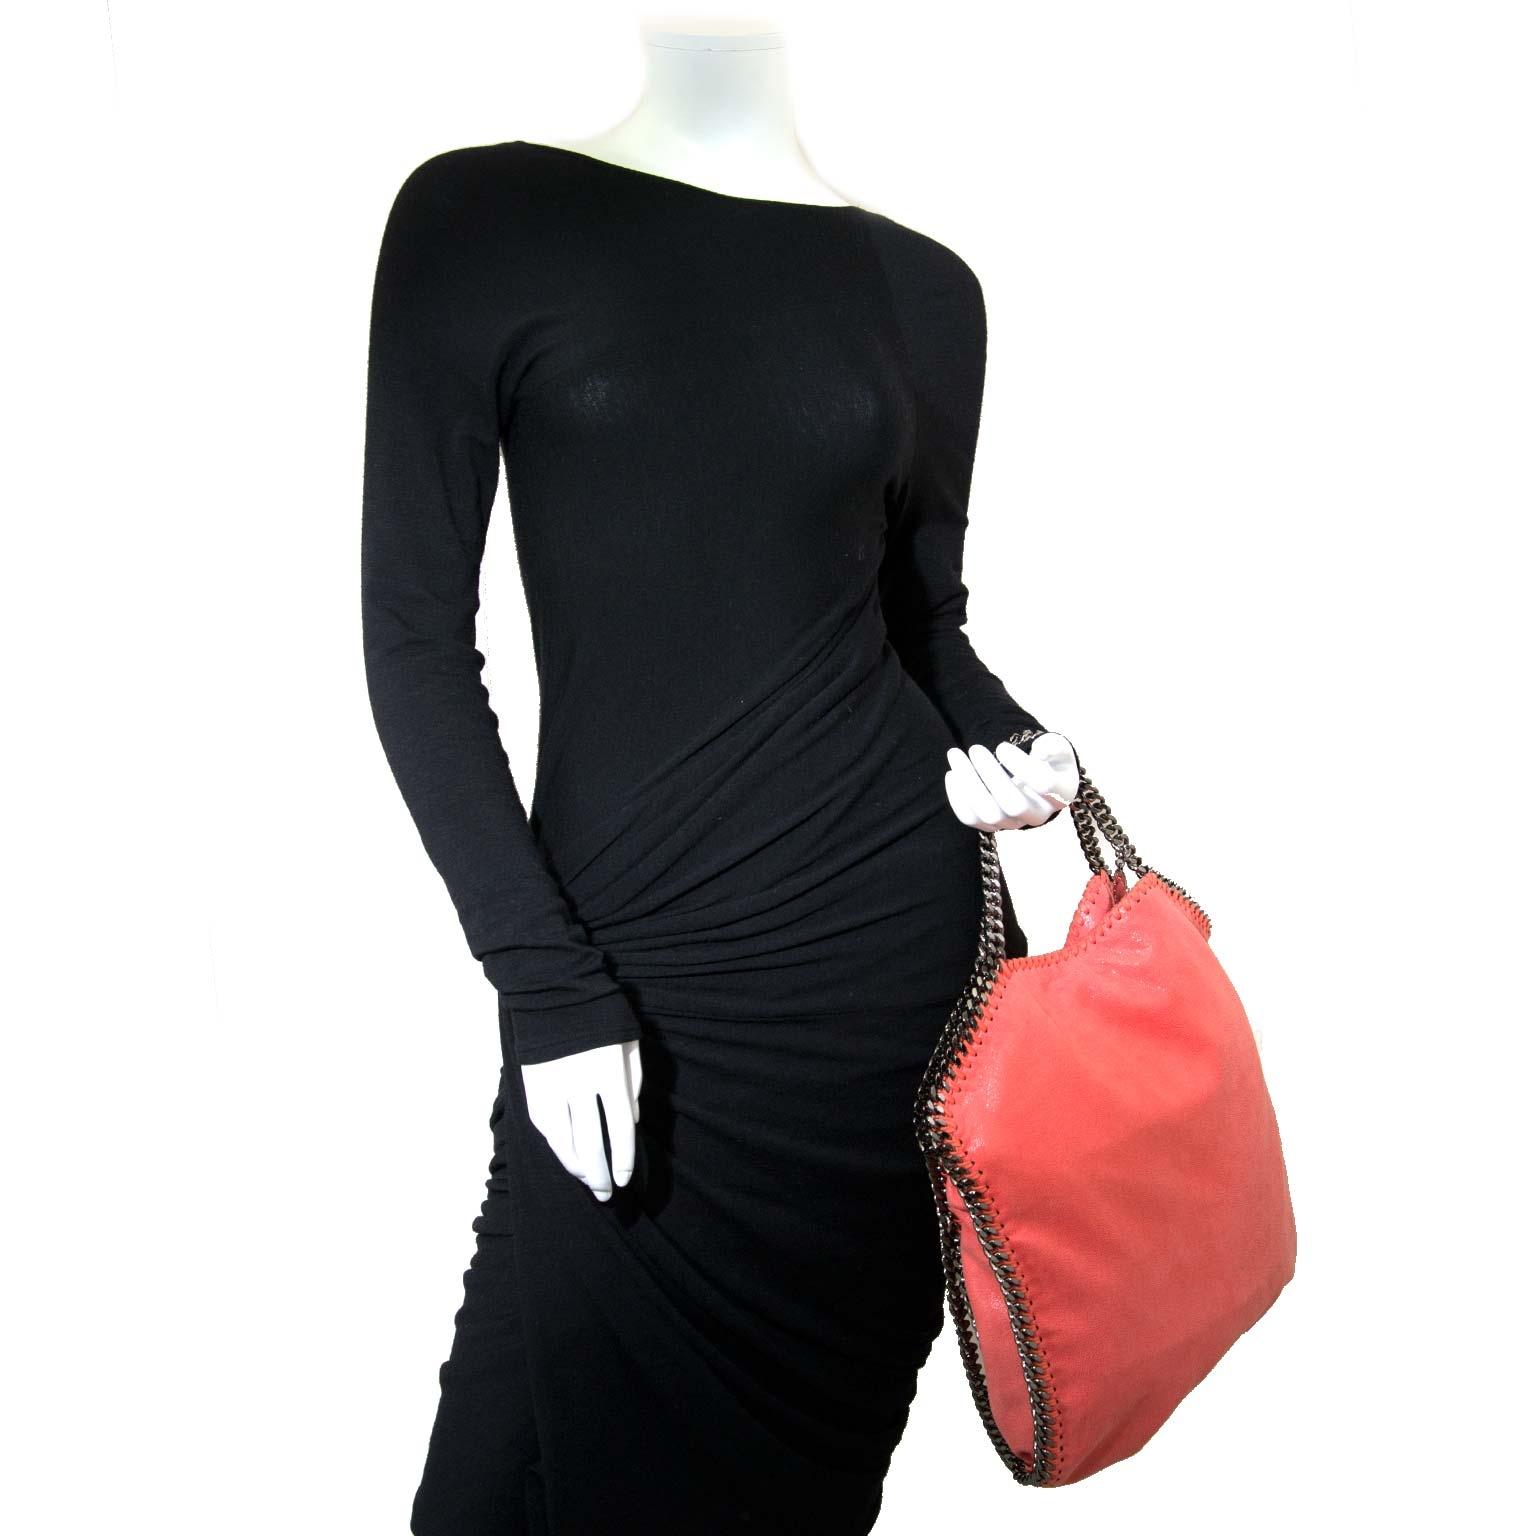 stella mccartney falabella salmon pink bag now for sale at labellov vintage fashion webshop belgium